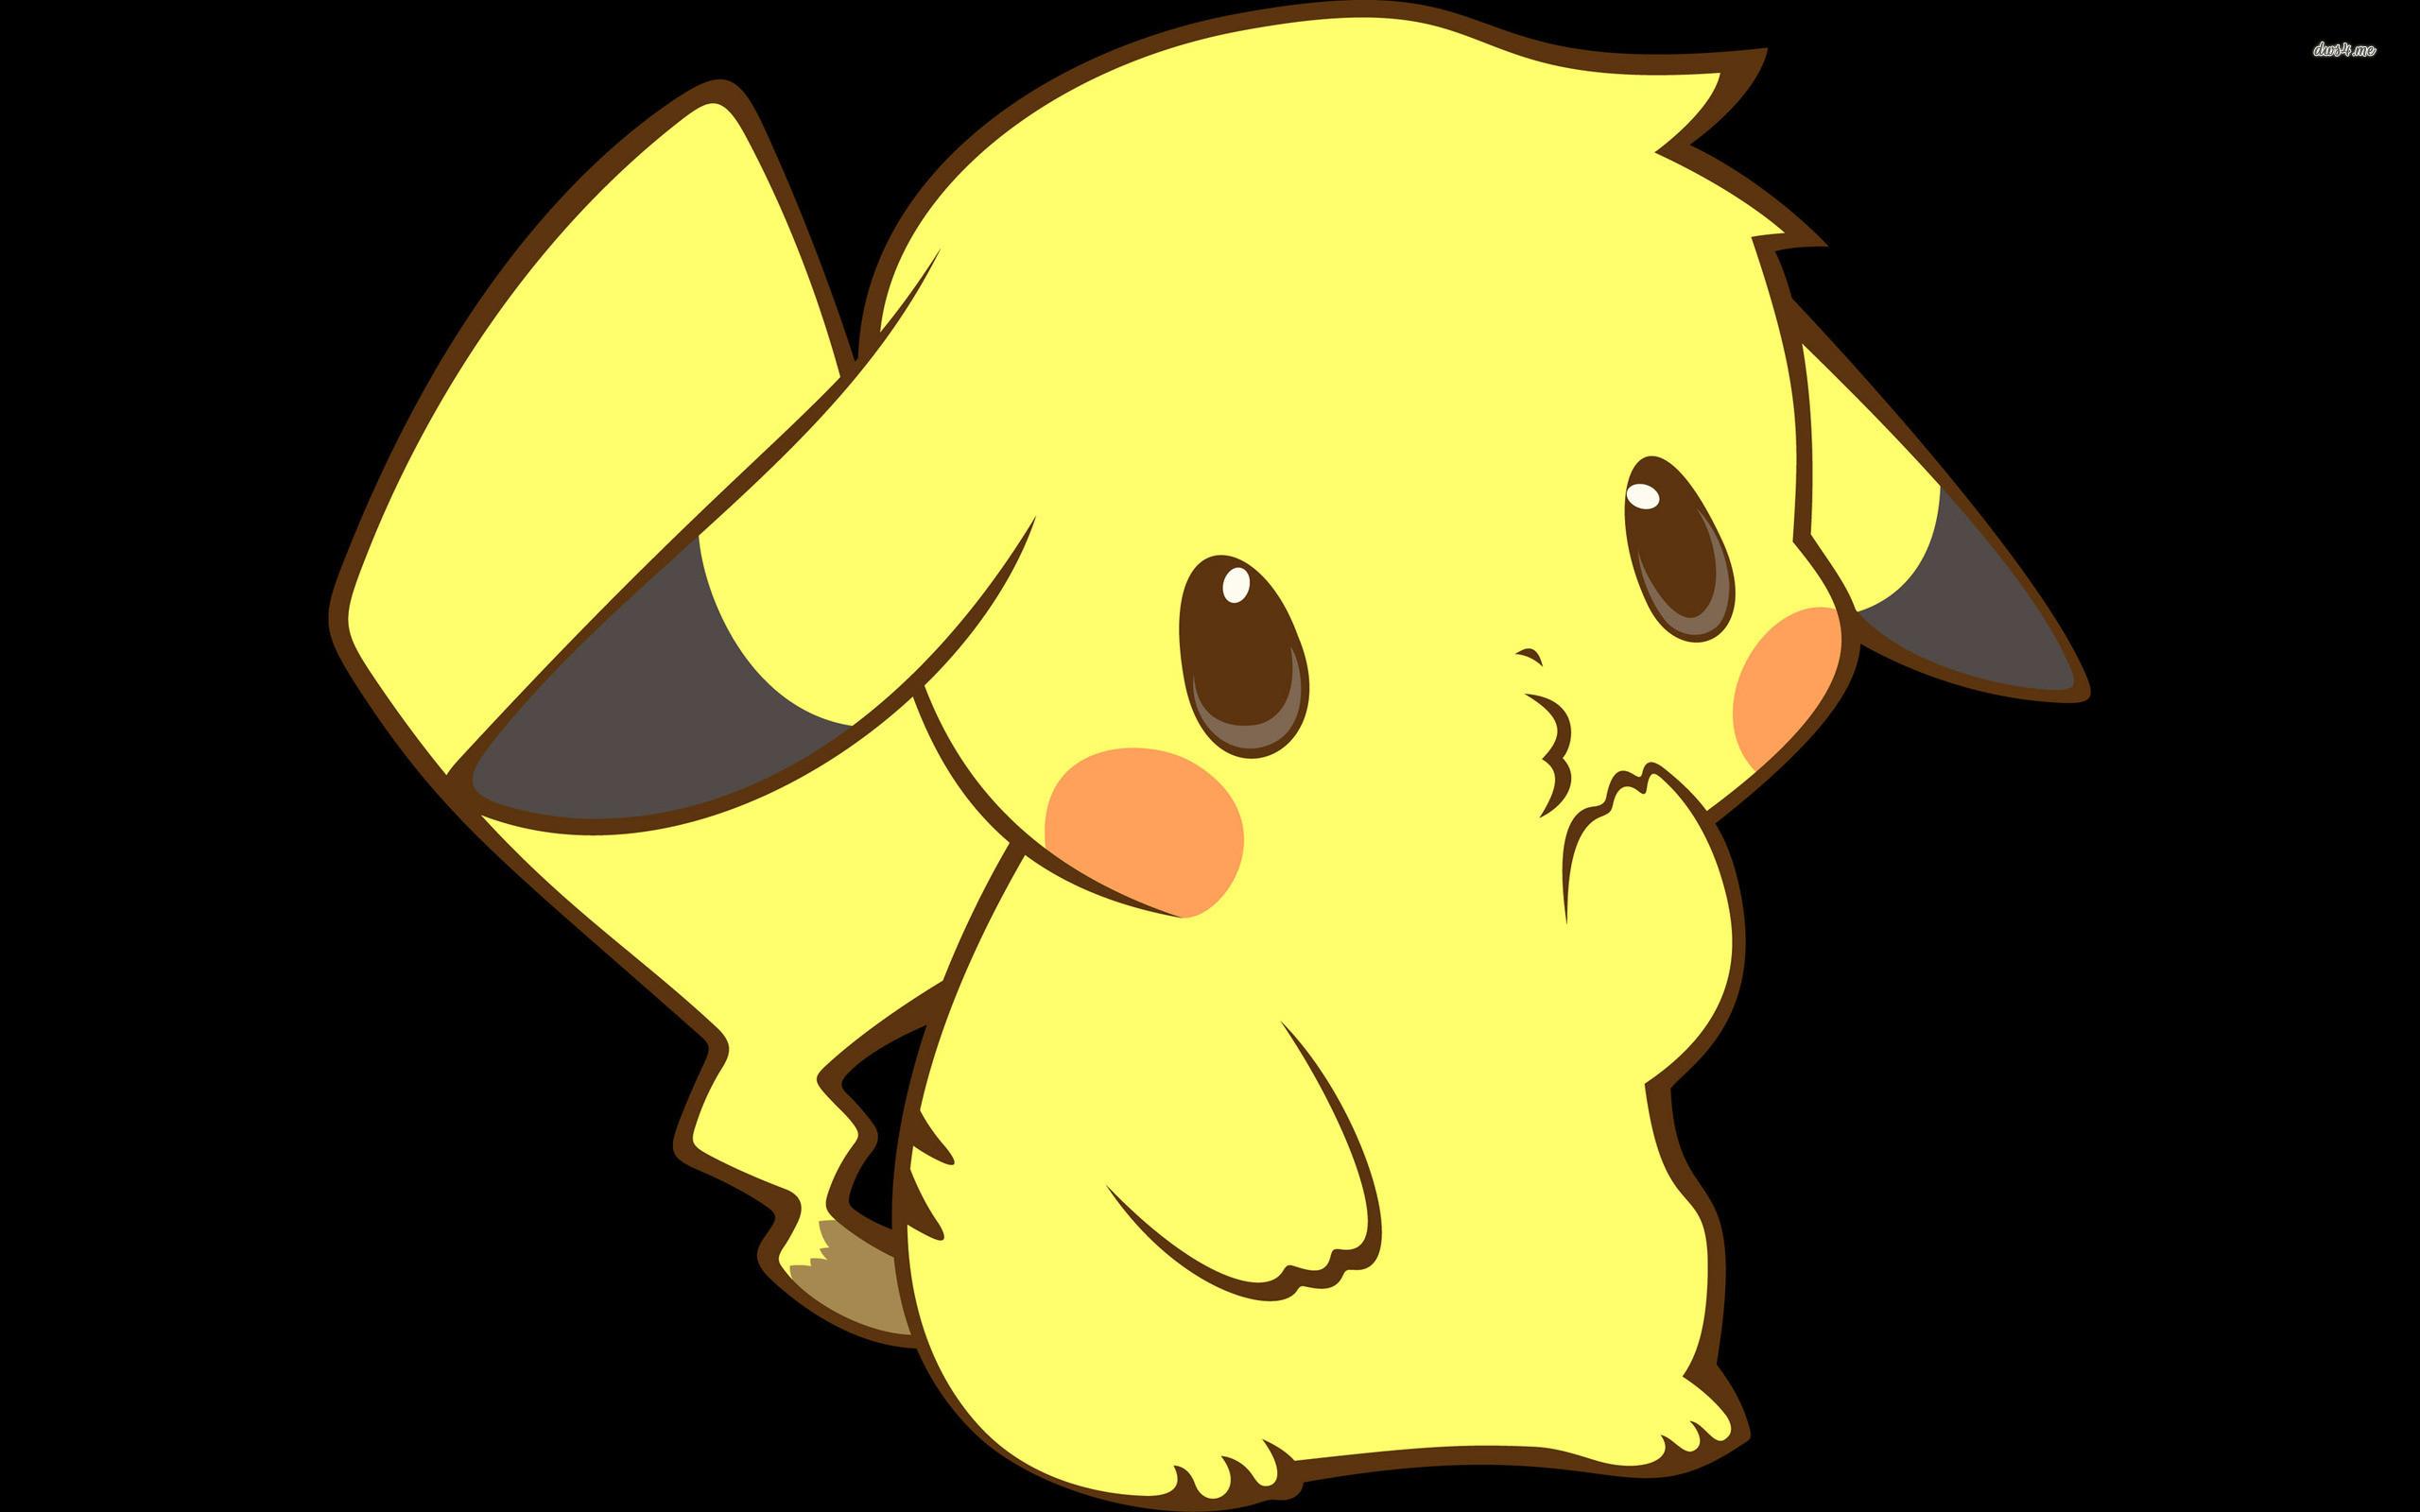 Pokemon-Cute-Pikachu-HD-Wallpapers-001